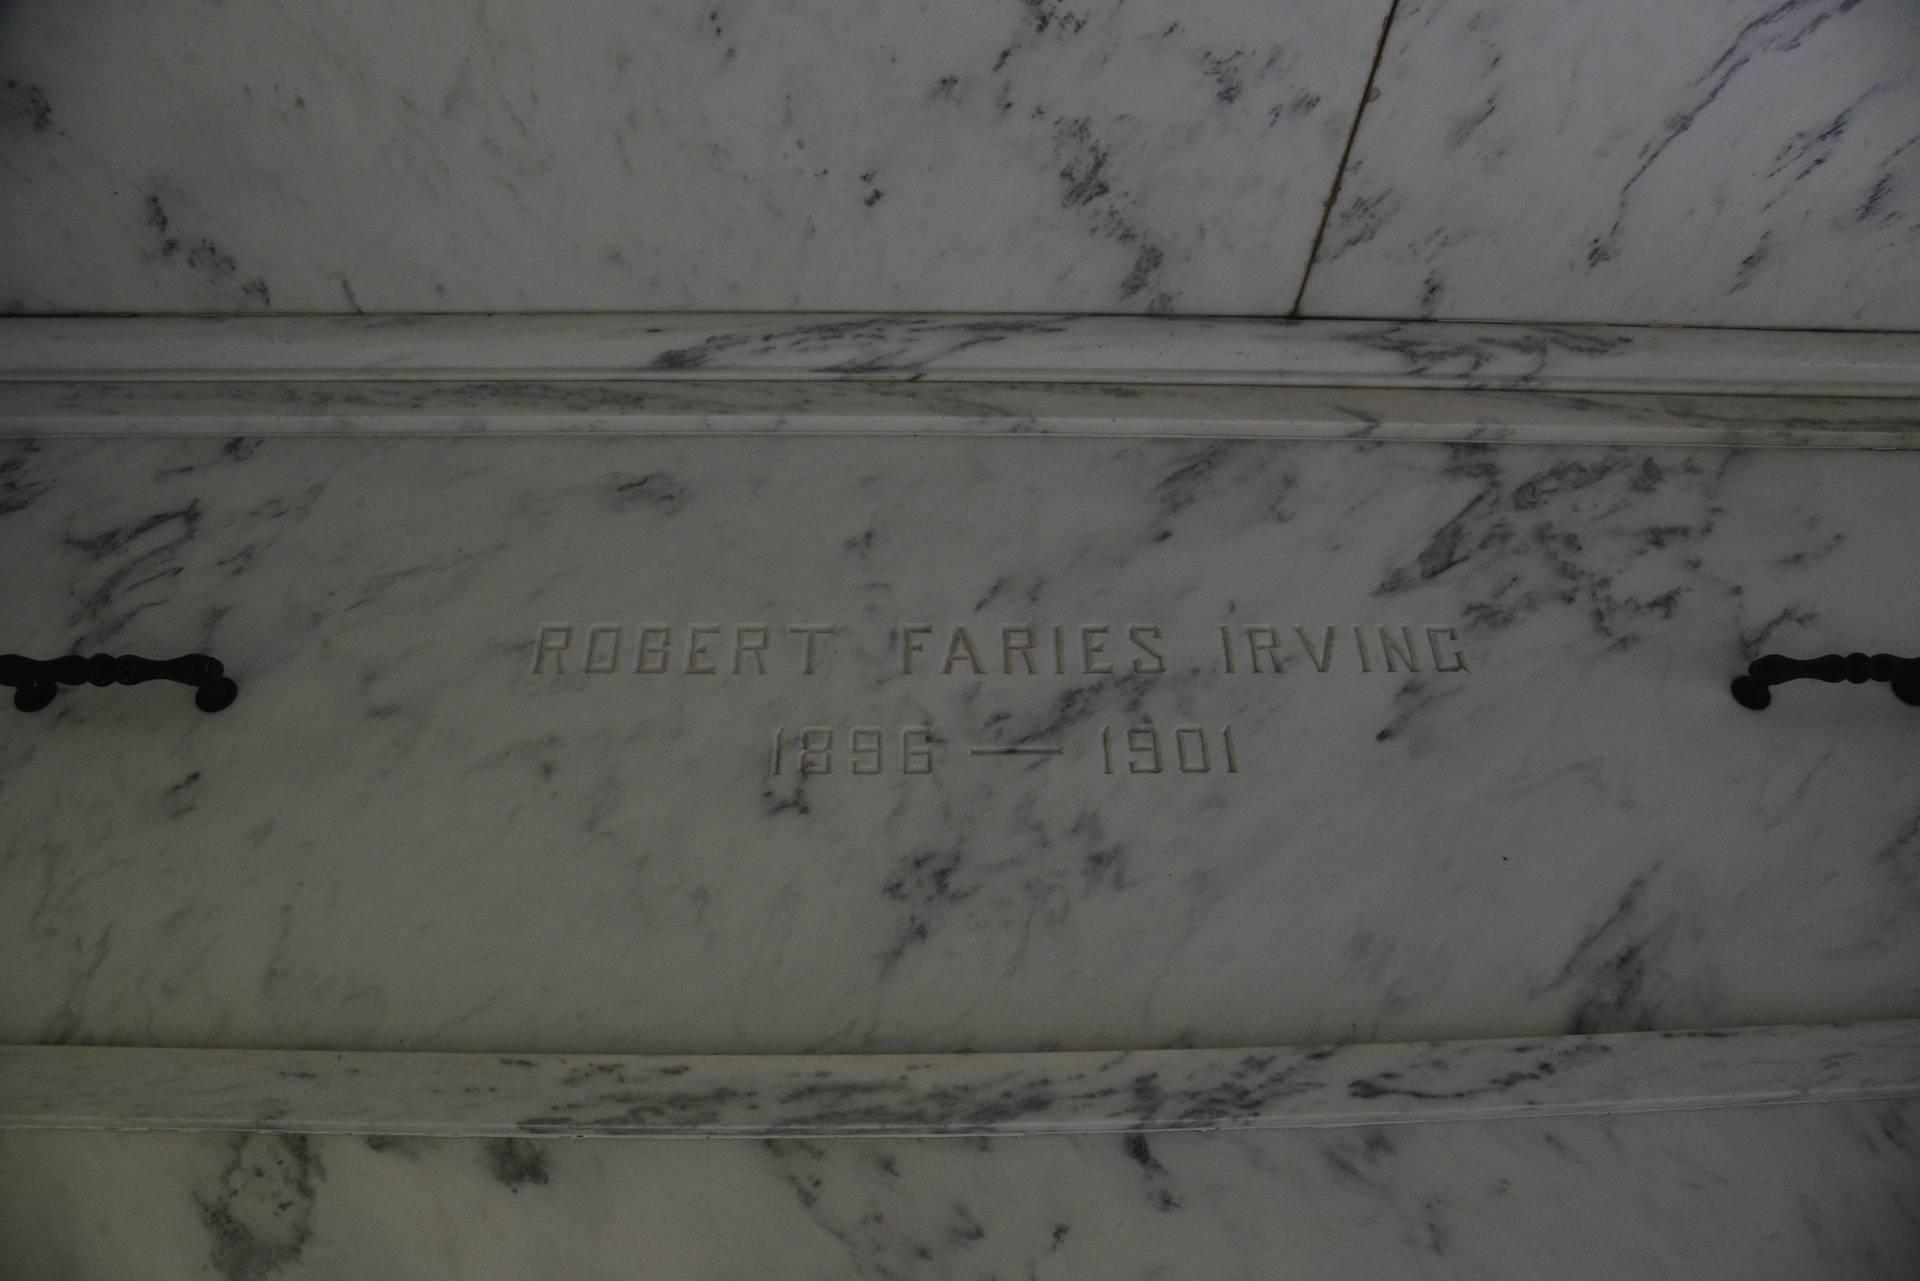 Robert Faries Irving - Son